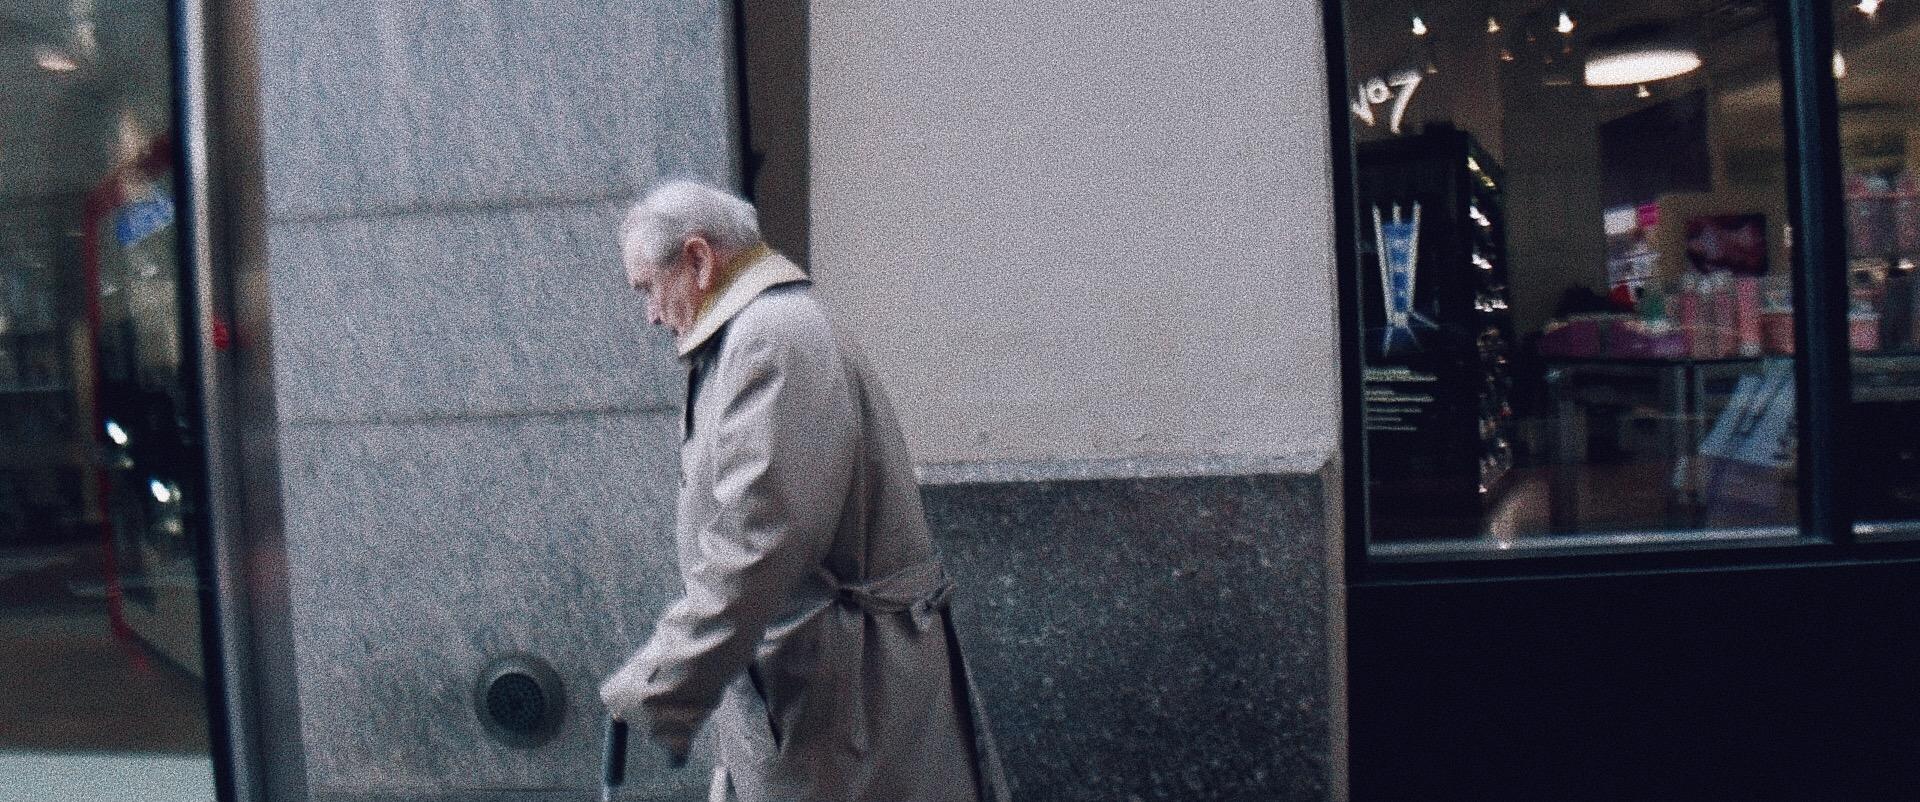 An elderly man walking in front of a concrete wall.